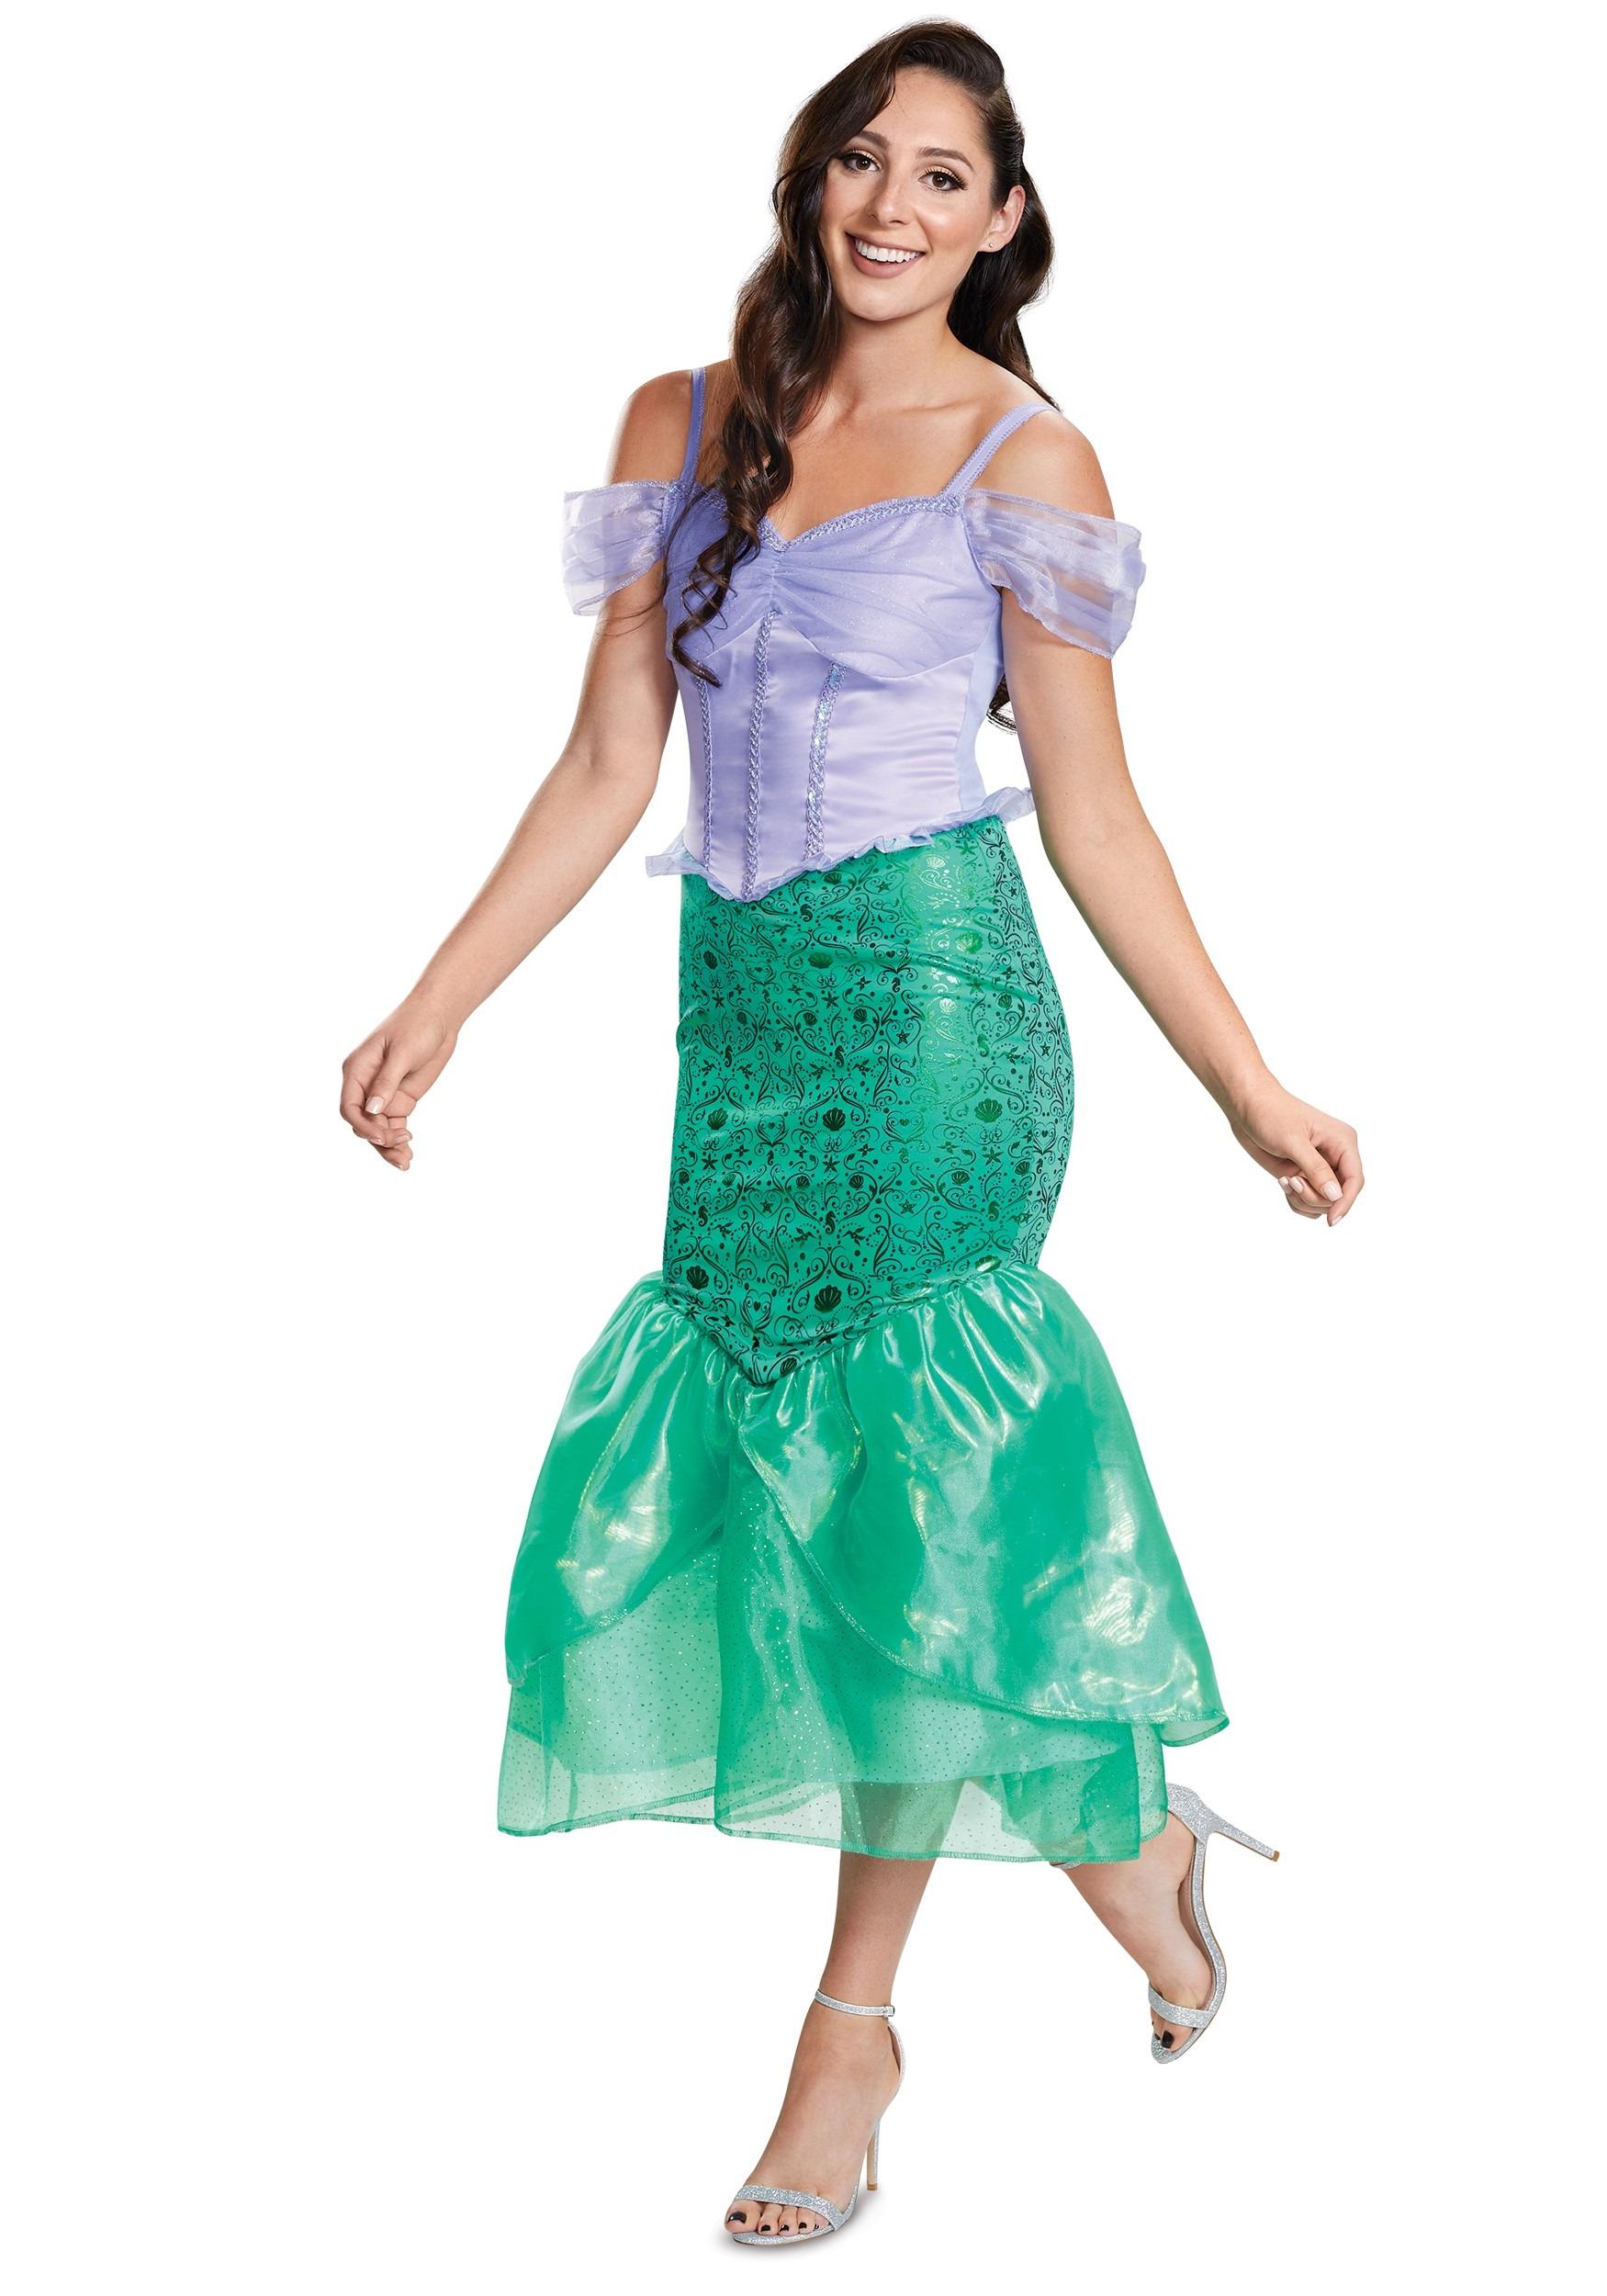 Deluxe Ariel Costume Adult The Little Mermaid